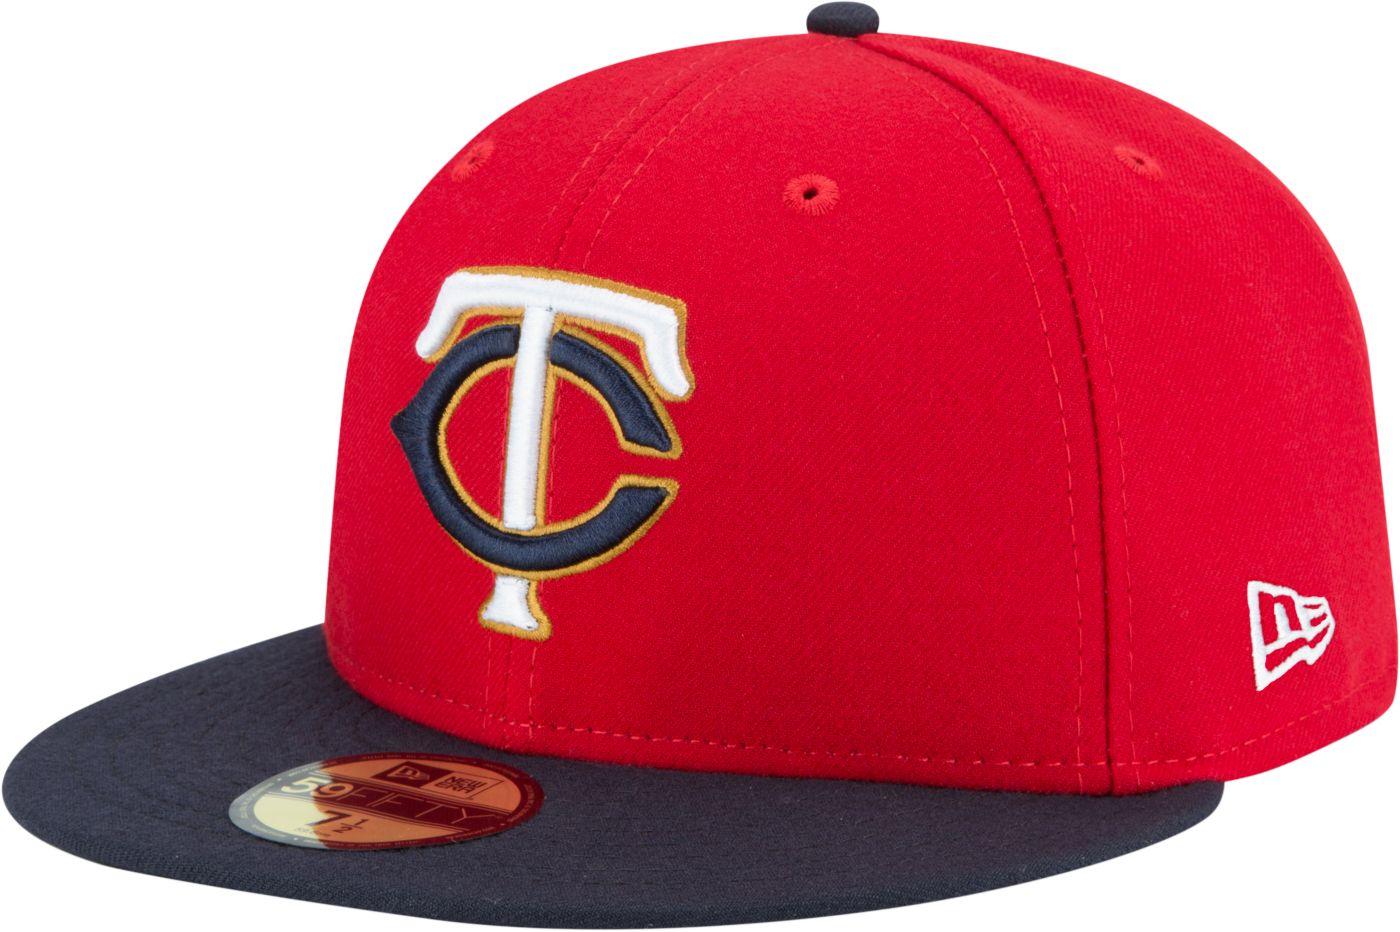 New Era Men's Minnesota Twins 59Fifty Alternate Red Authentic Hat